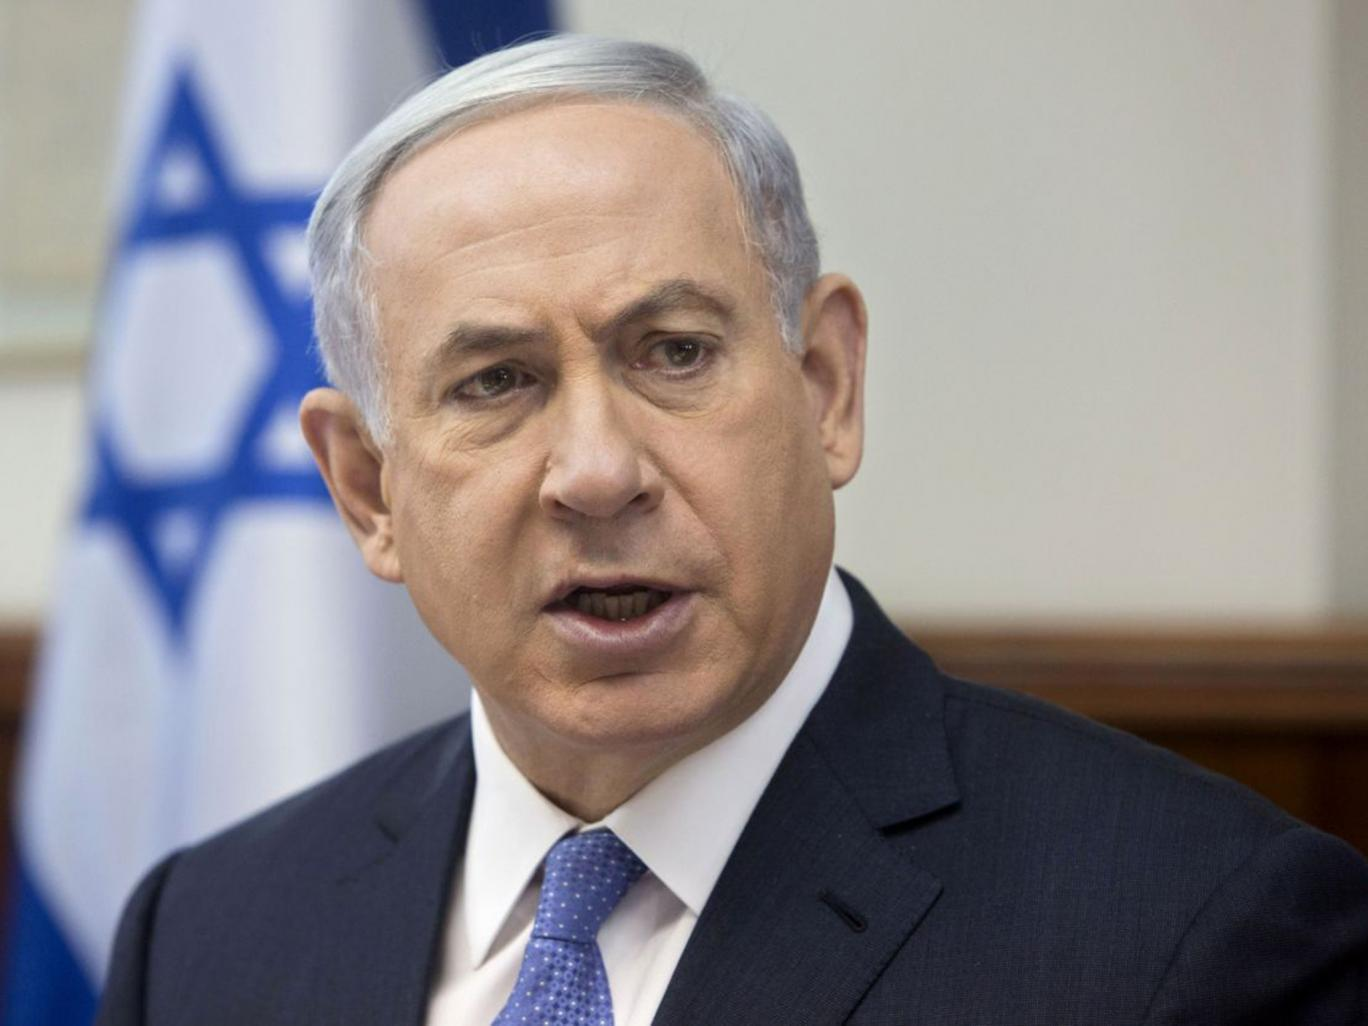 Spain issues arrest warrant for Israeli PM Netanyahu